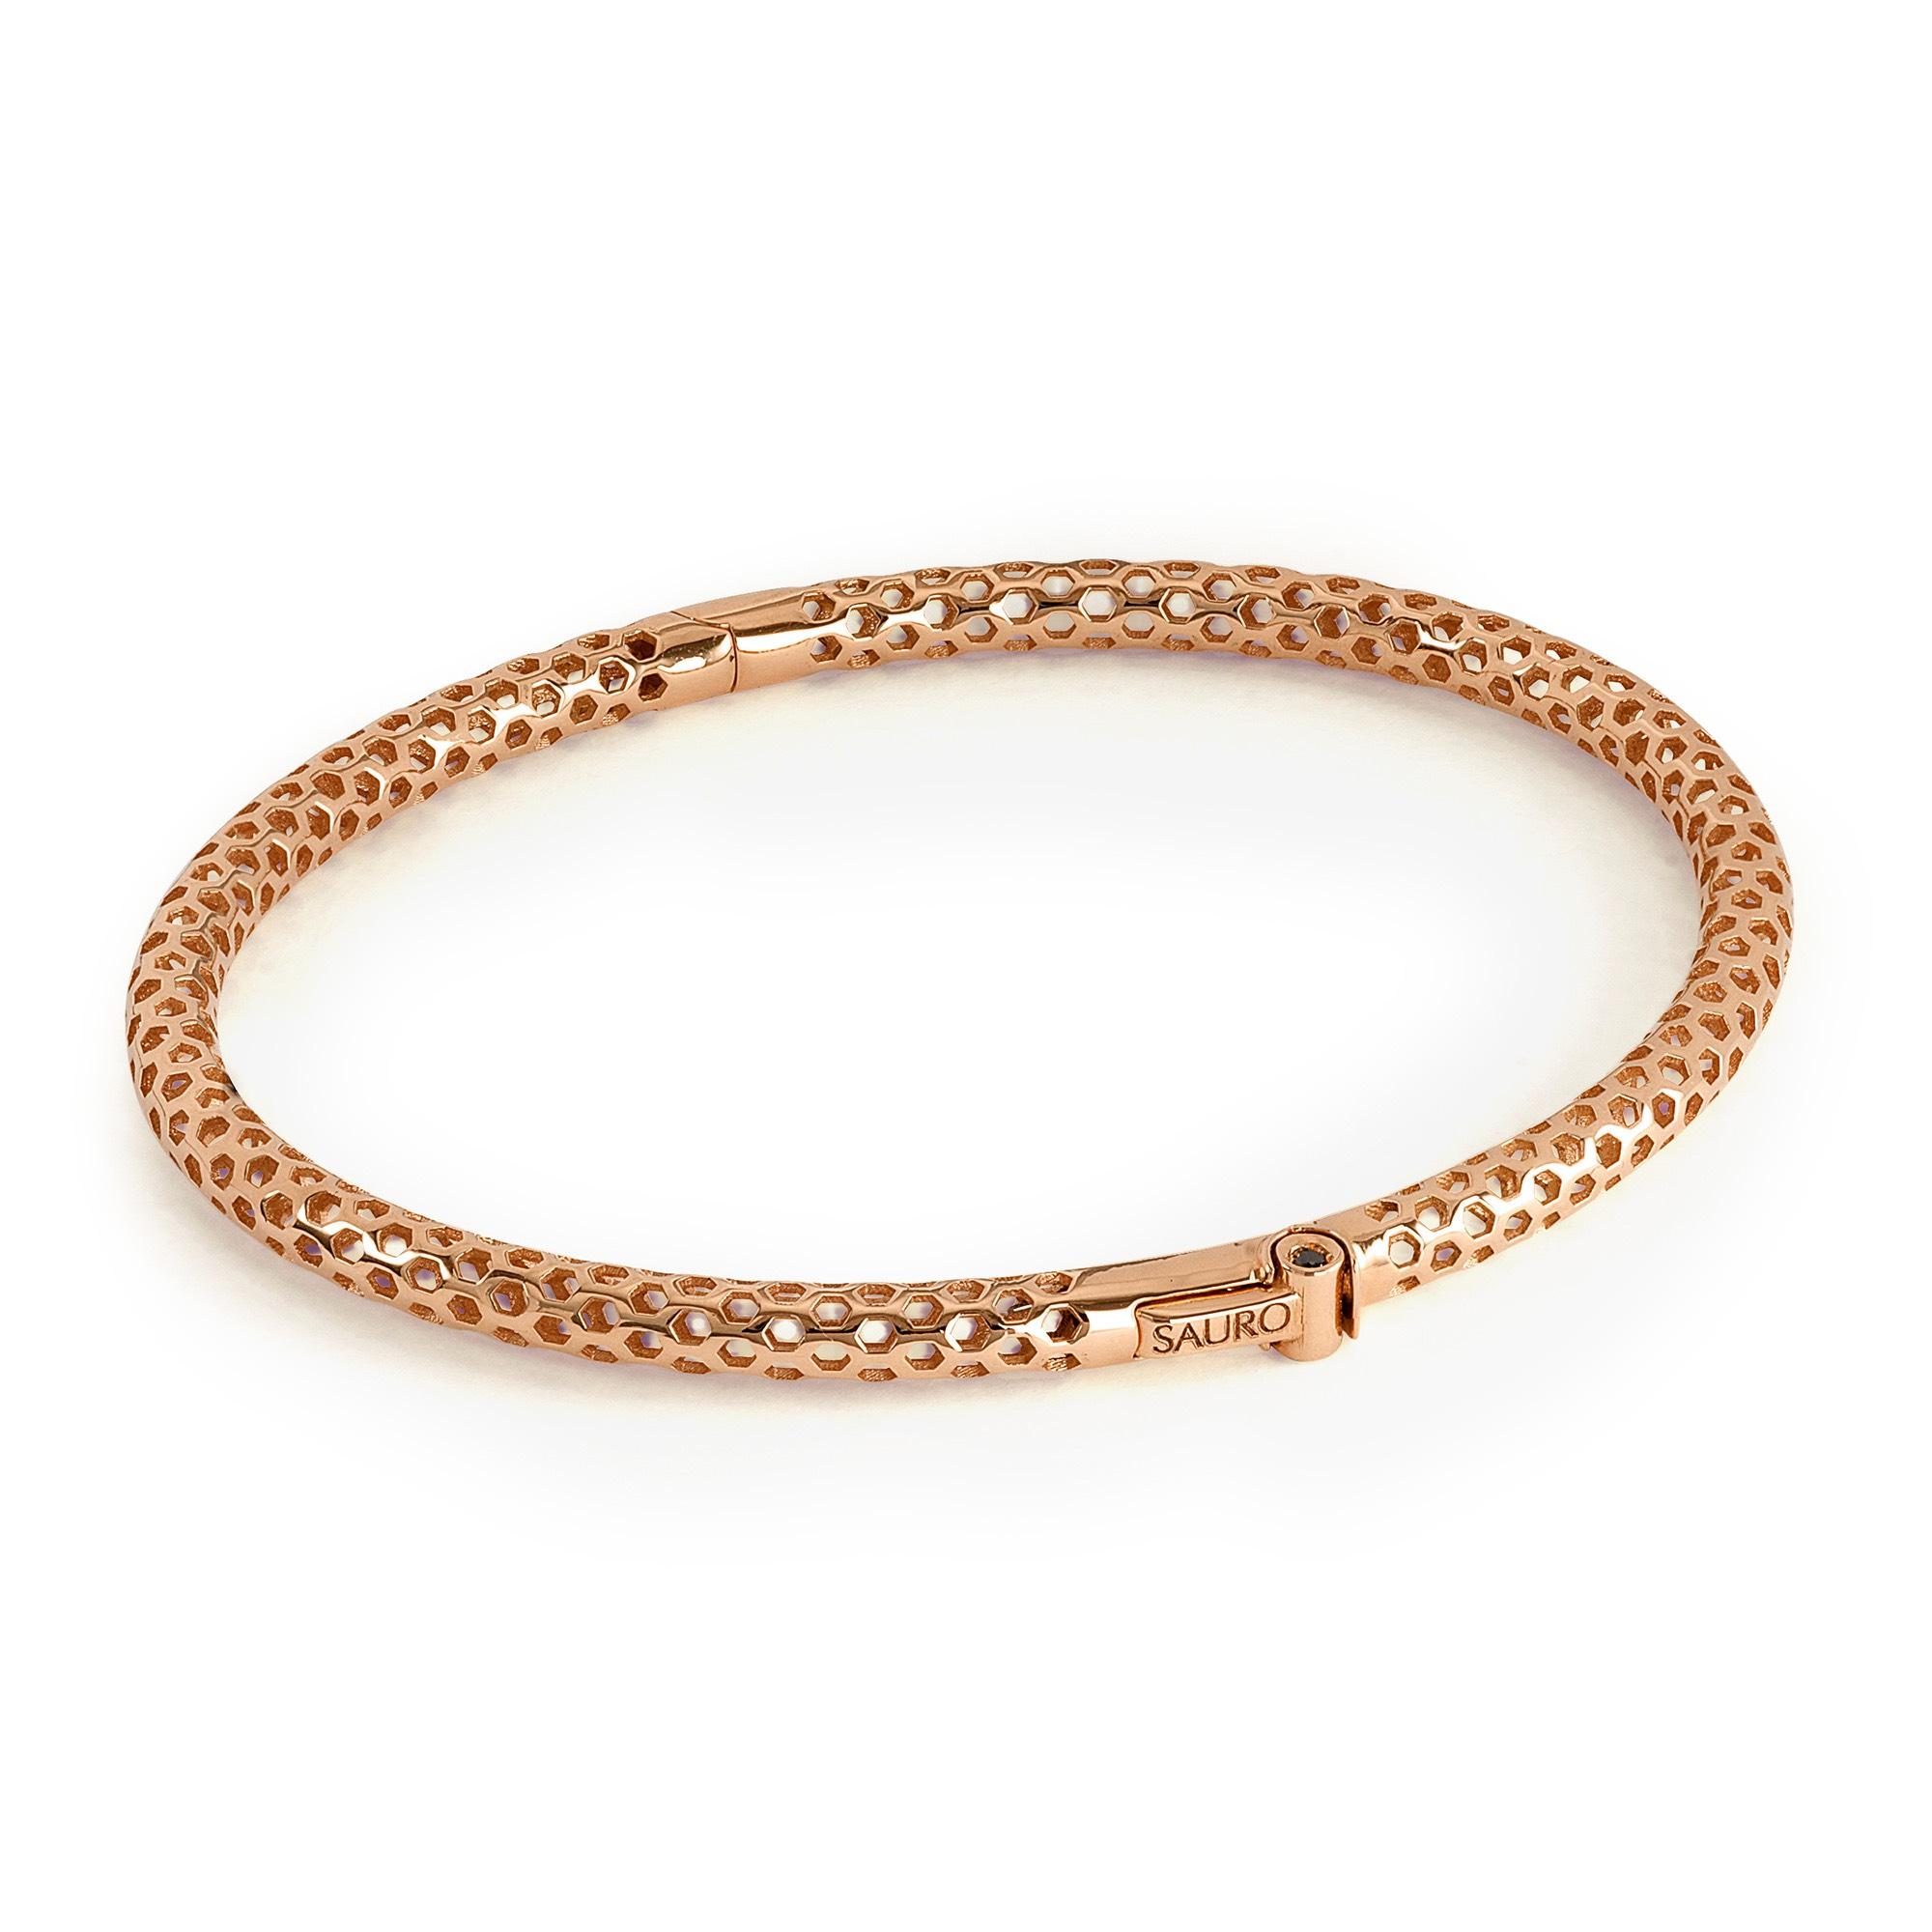 5655d21e3dc63 Luxurious Men's Gold Diamond Bangle Bracelet   Yellow, Rose, White ...